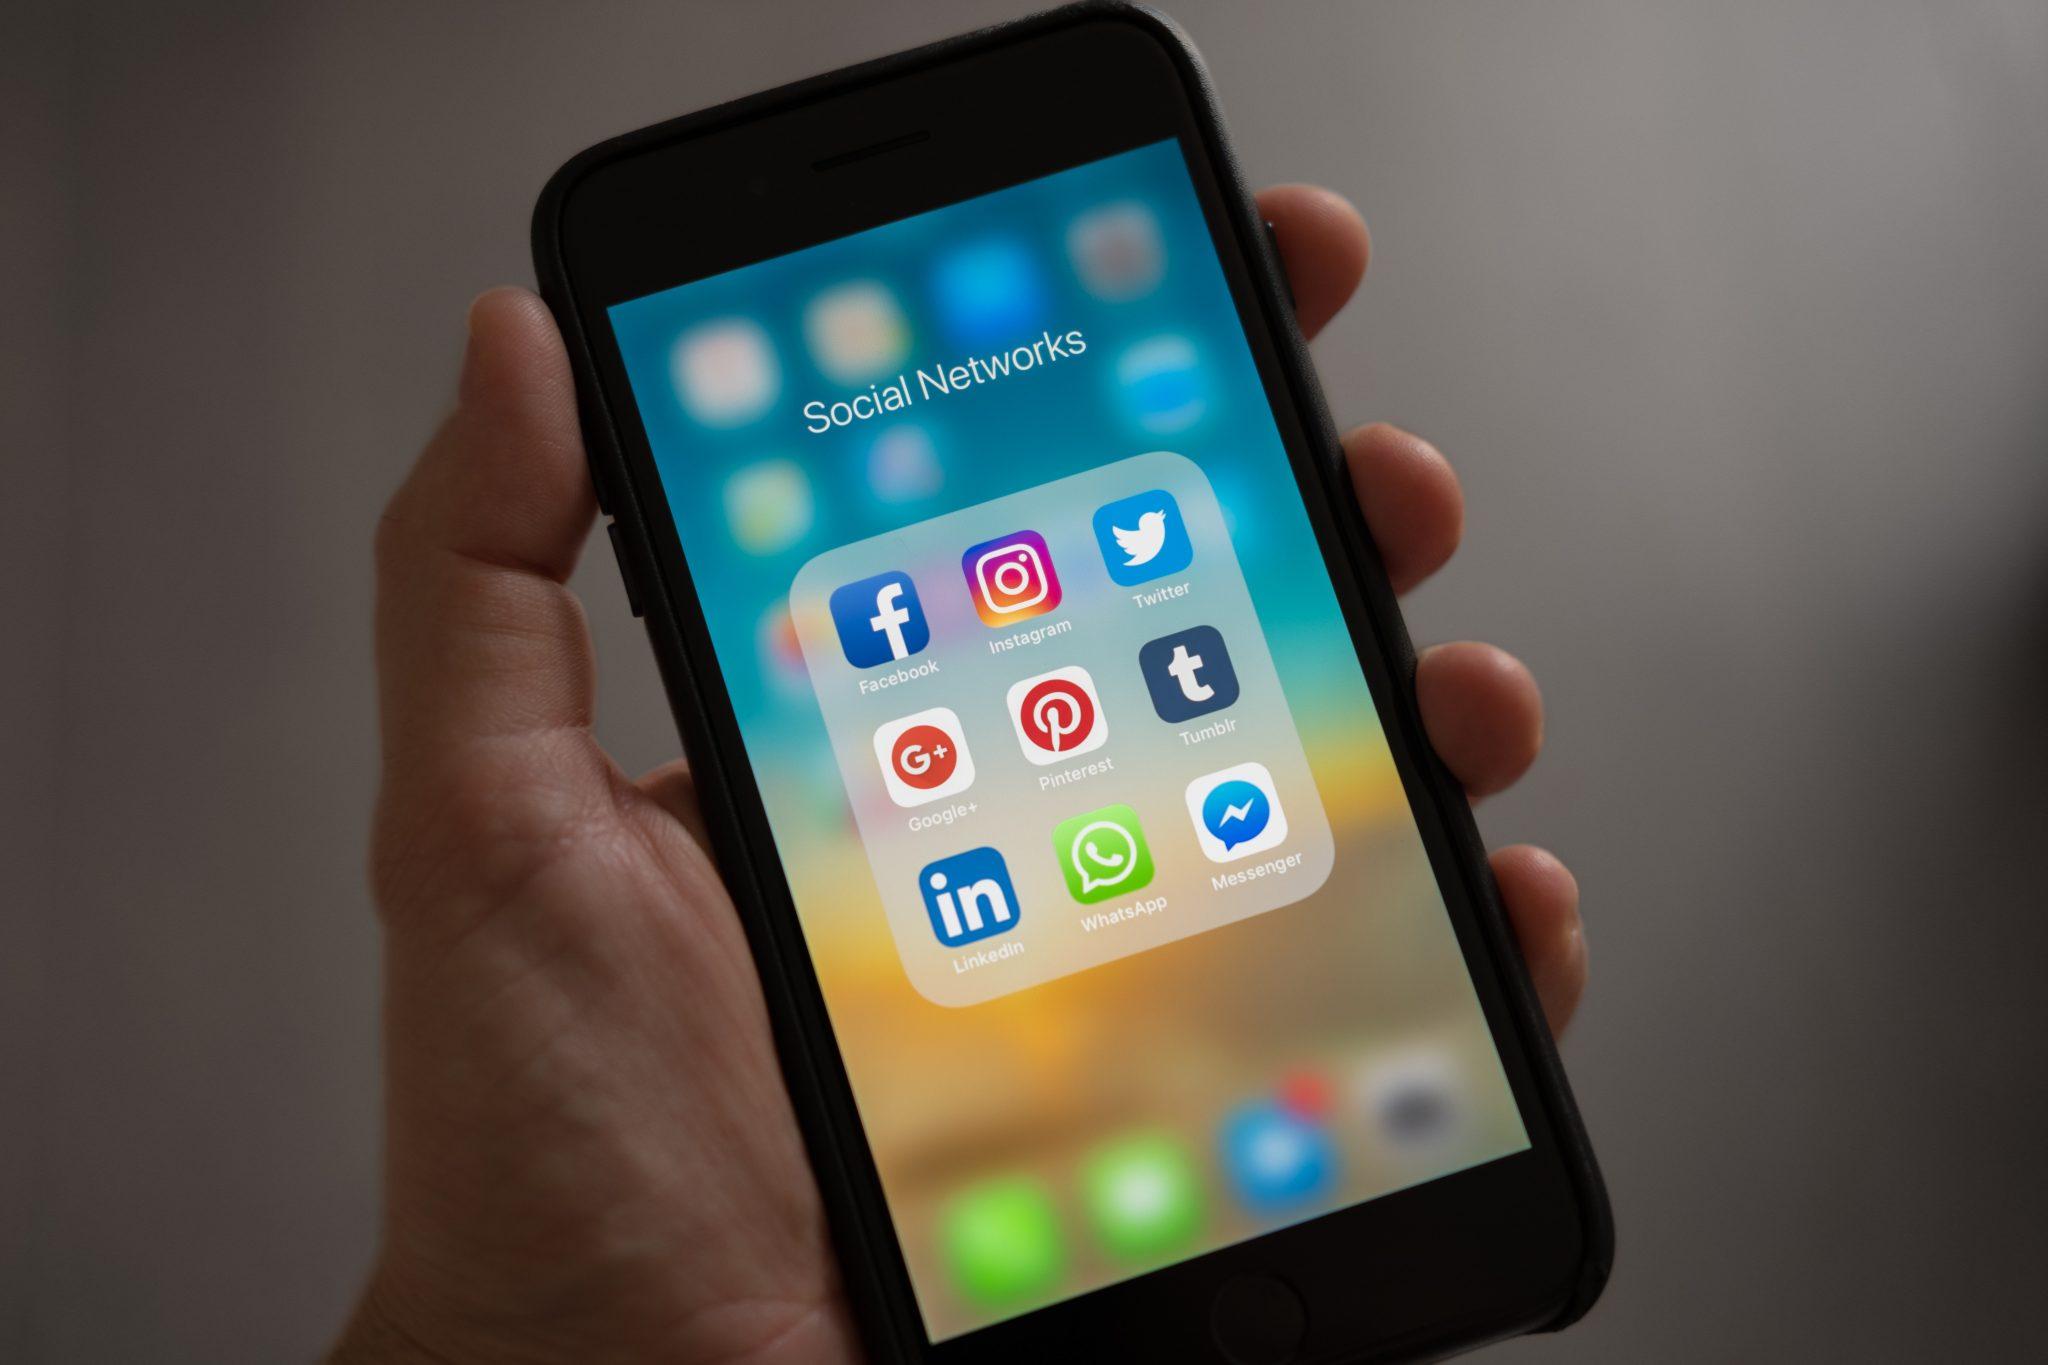 With Streamtech's fast fiber internet, you can do social media